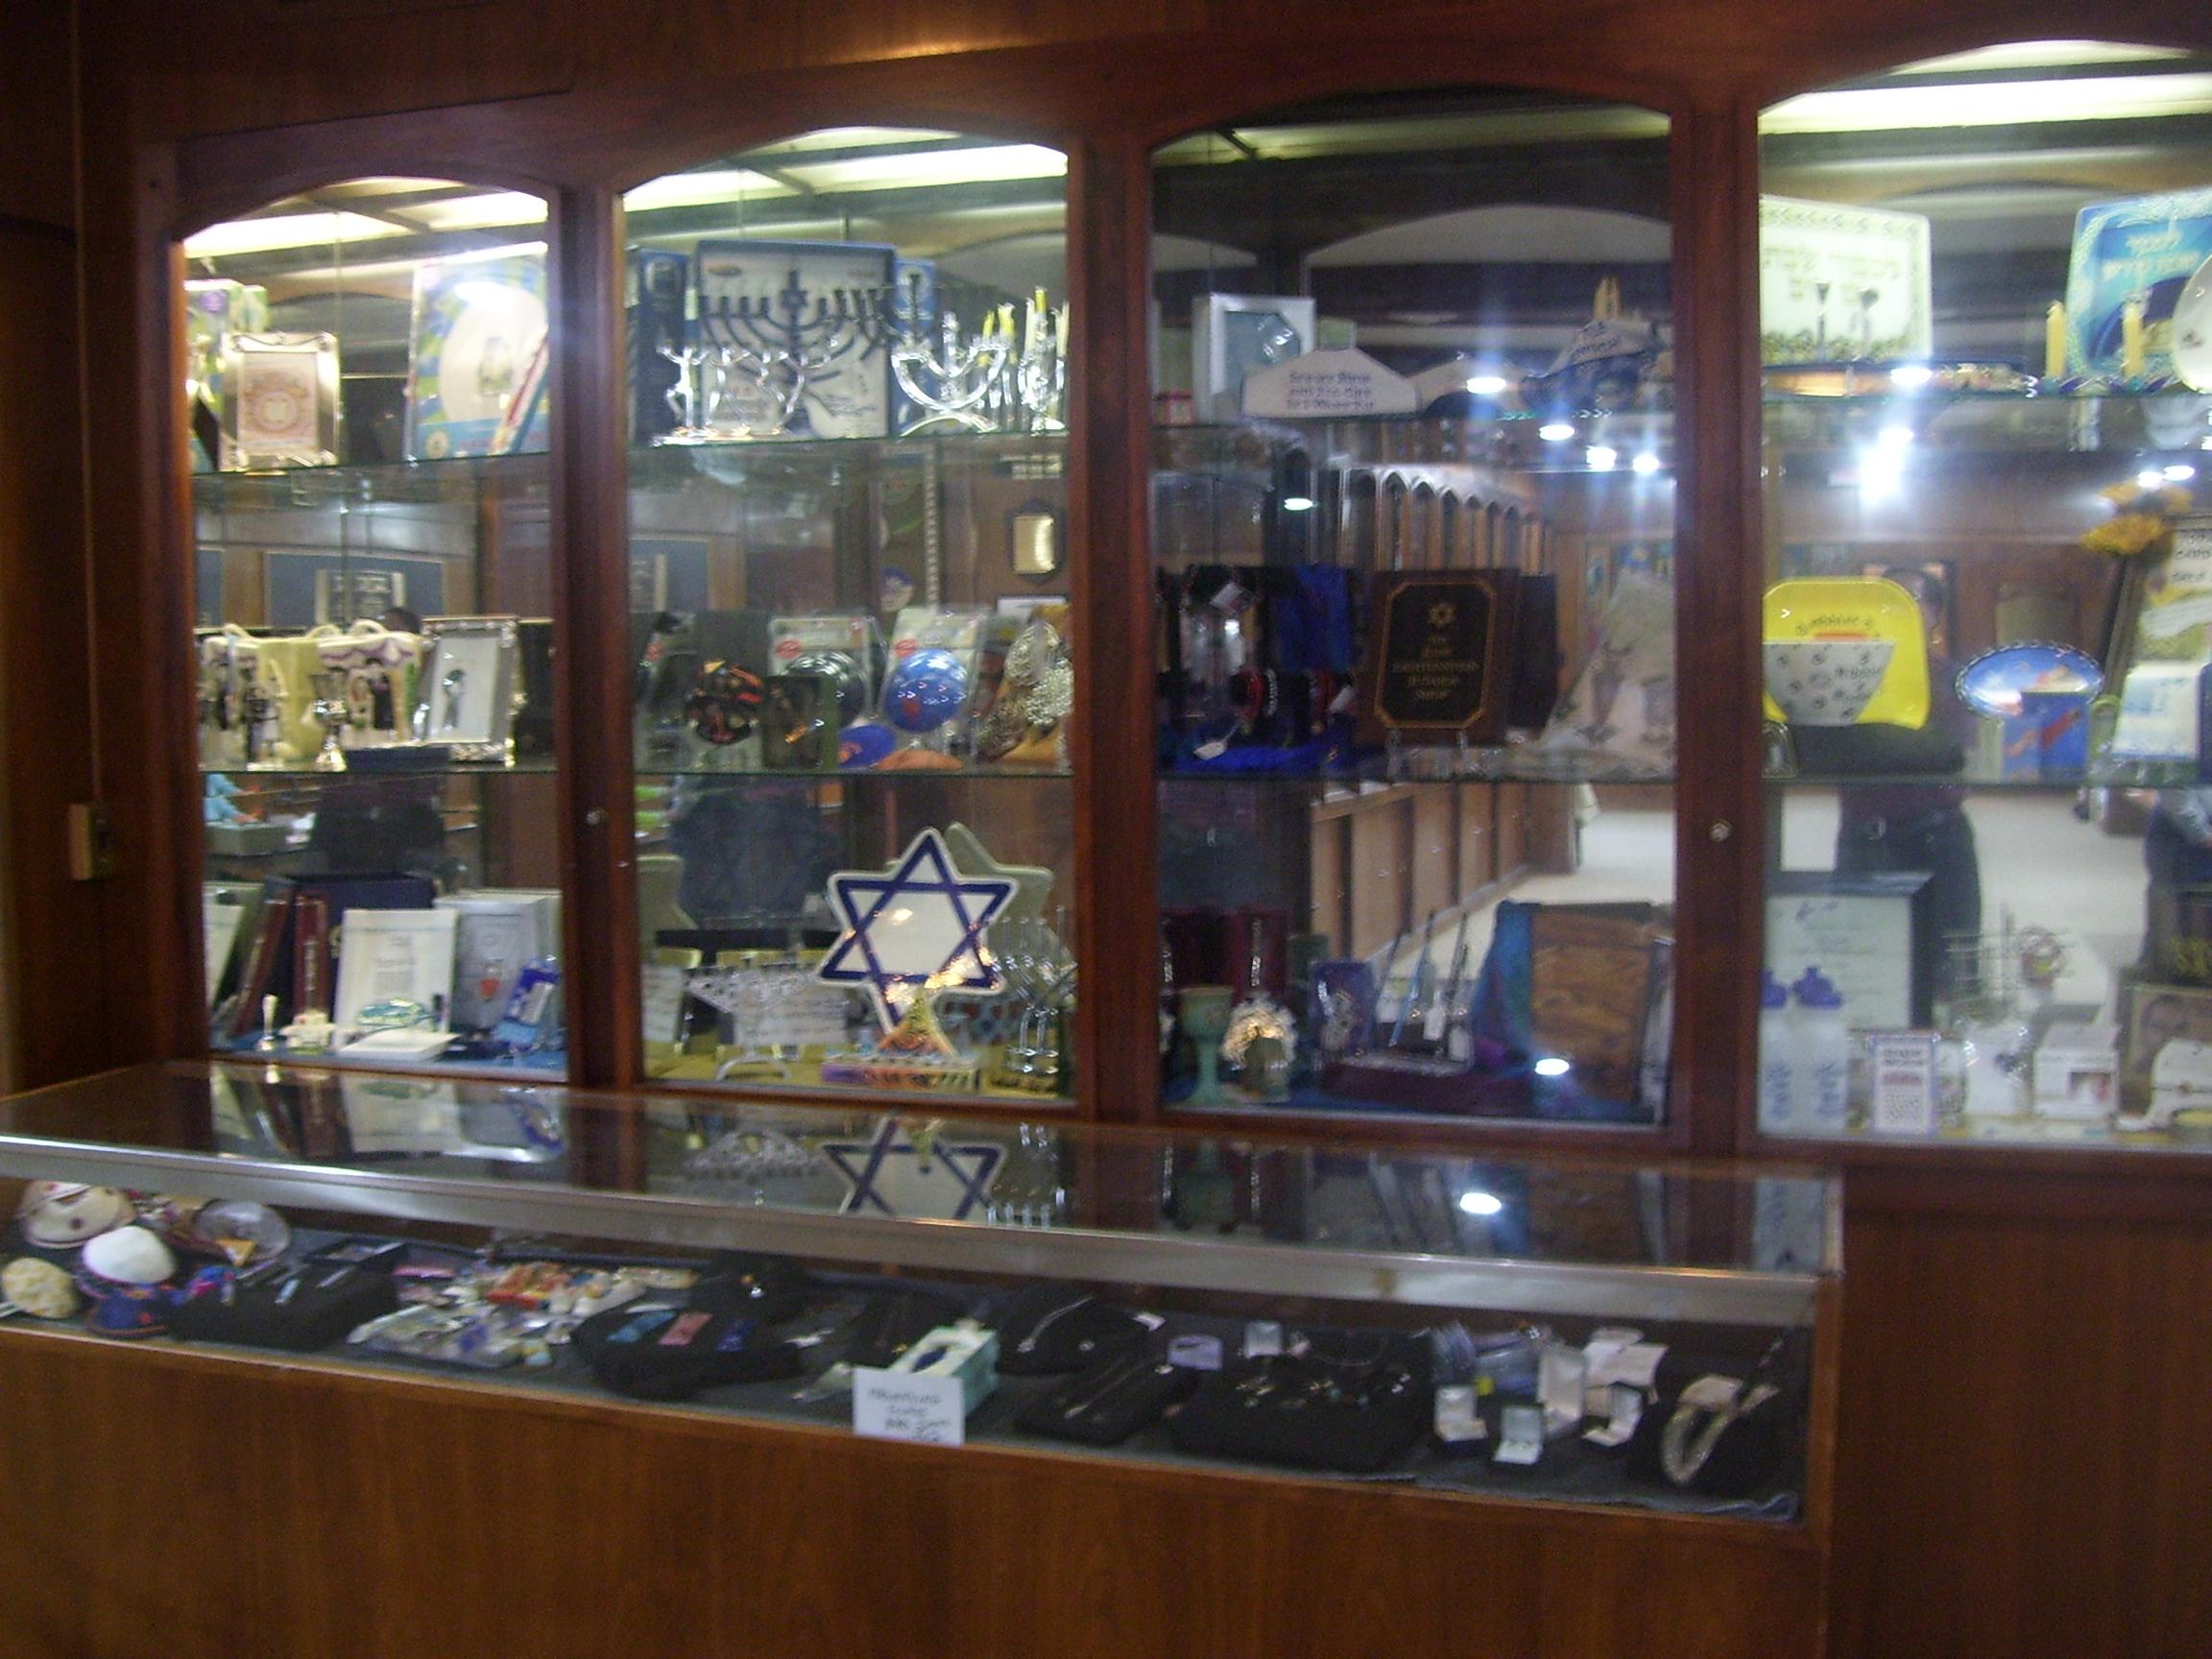 Judaic Shop